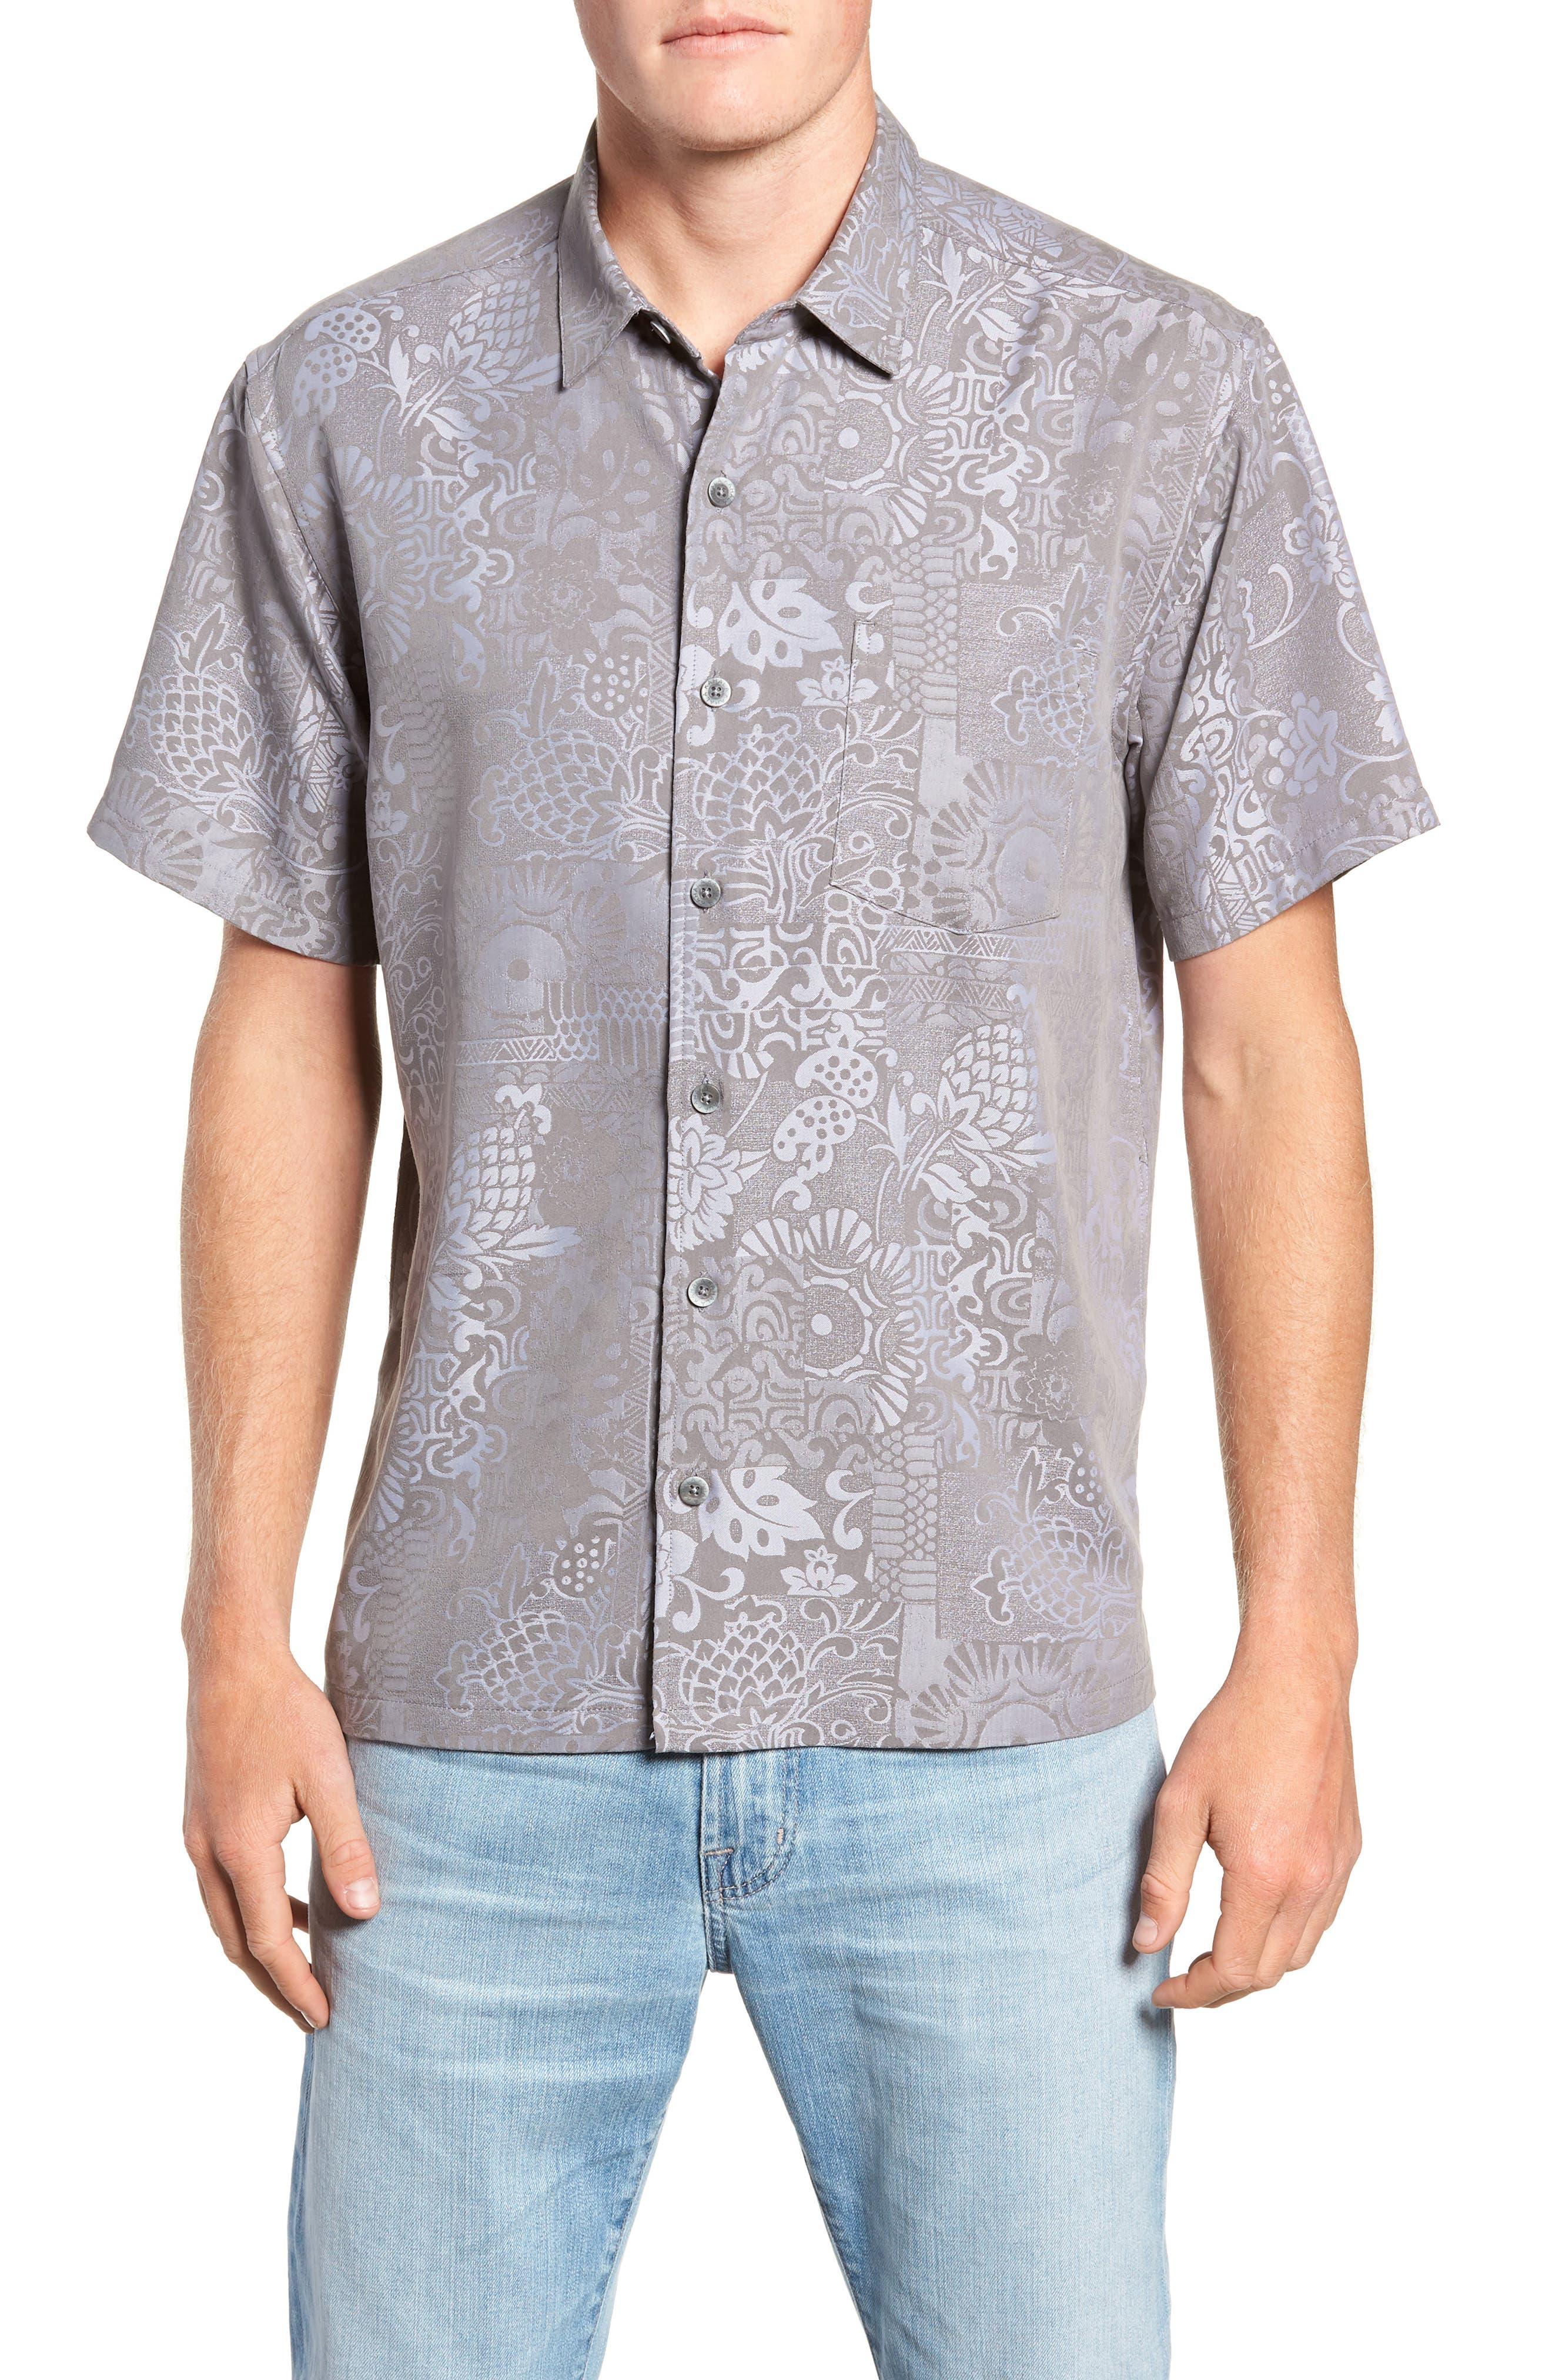 Apana Classic Fit Jacquard Sport Shirt,                             Main thumbnail 1, color,                             CHARCOAL